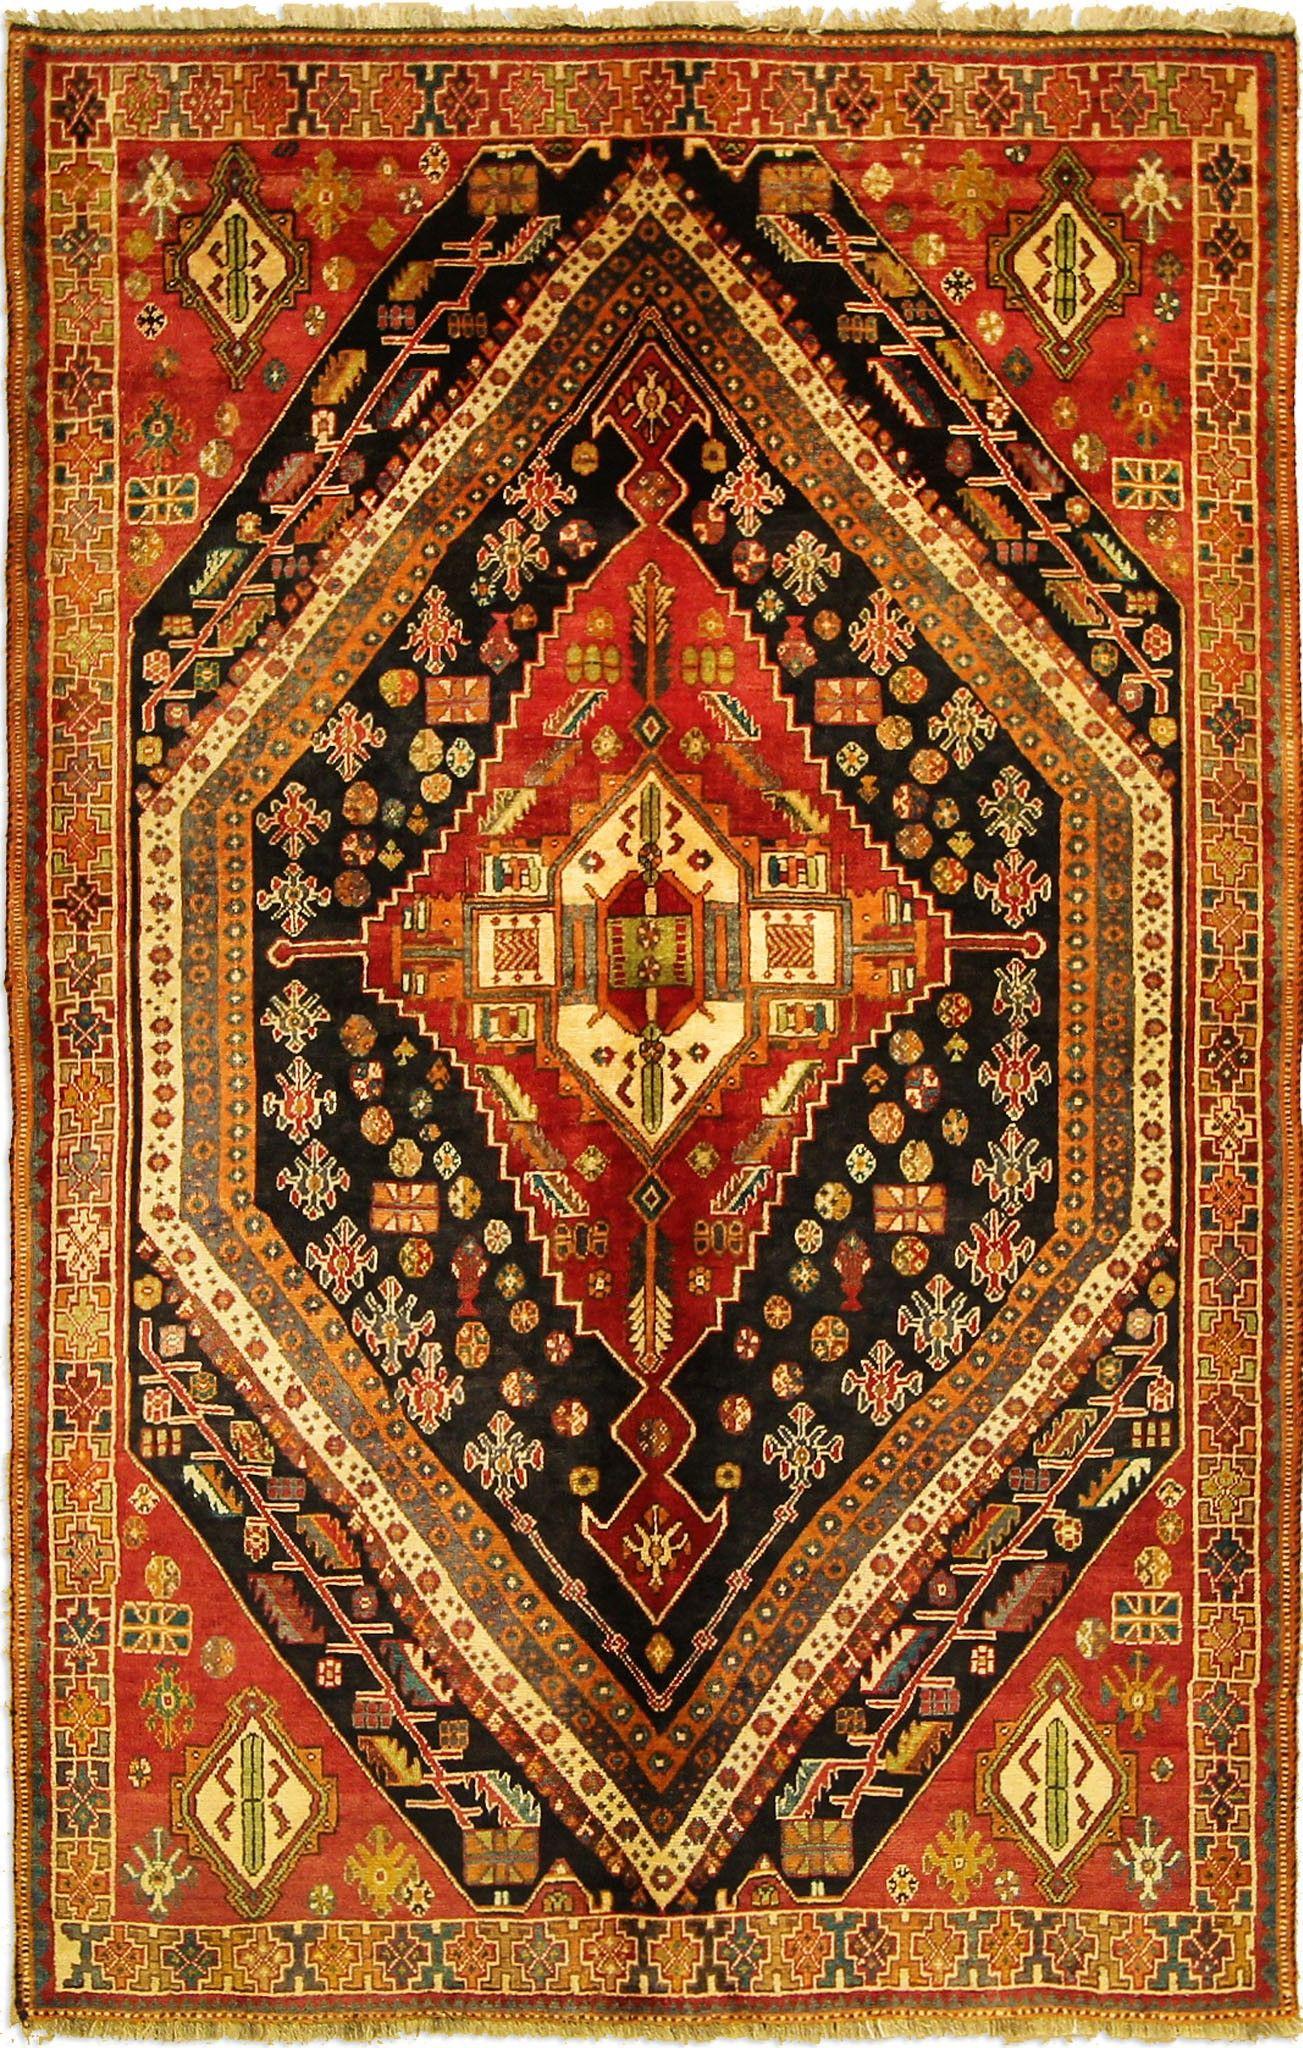 oriental qashqai rug 249 x 162 cm 249 x 162 cm rugs pinterest teppiche fliegender teppich. Black Bedroom Furniture Sets. Home Design Ideas